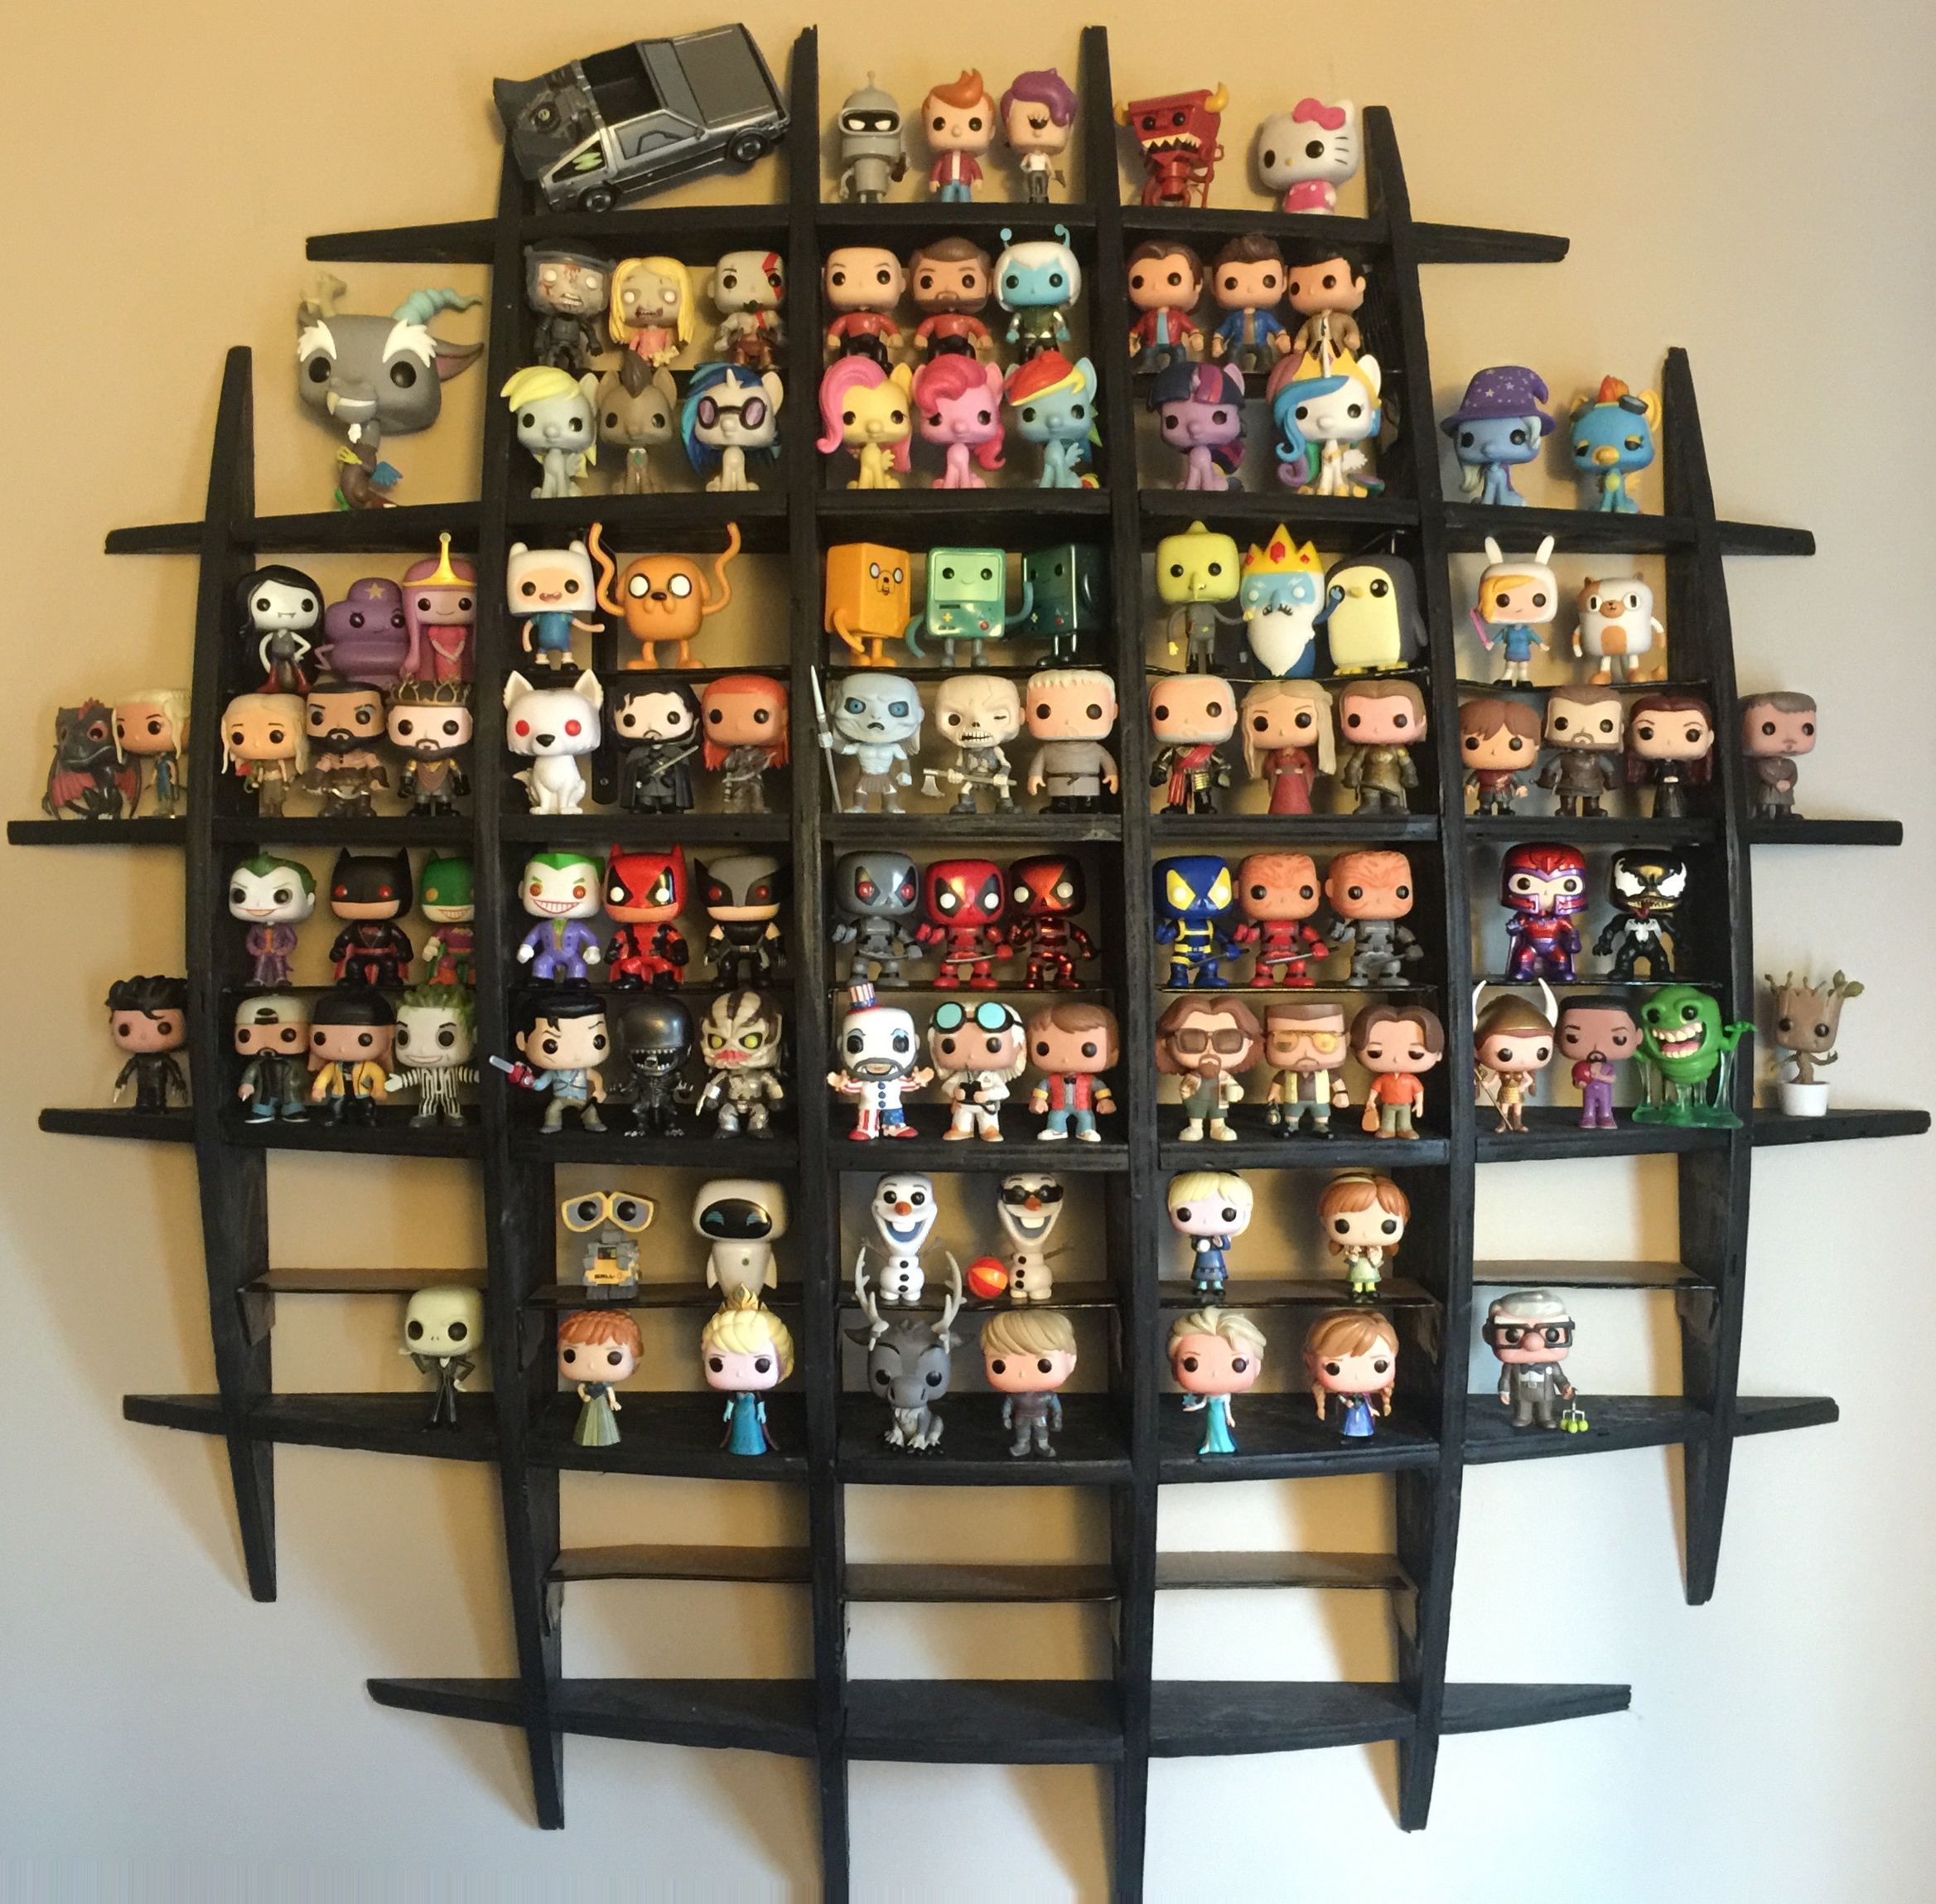 Funko Pop Collection Pop Collection Funko Pop Shelves